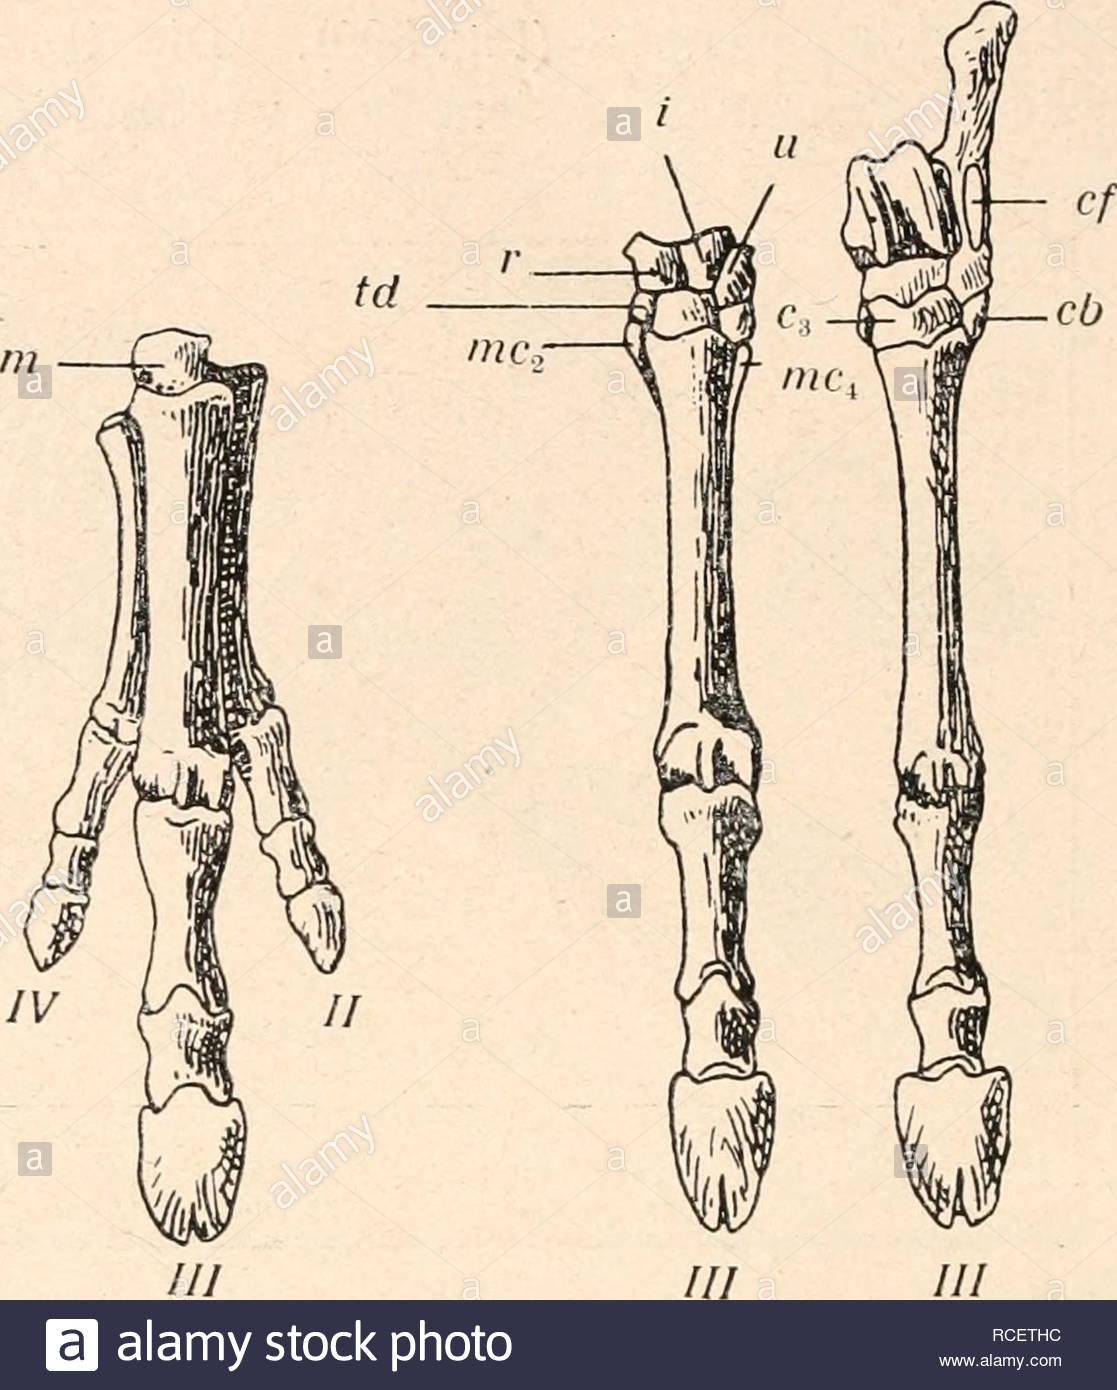 stmme der wirbeltiere evolution paleontology vertebrates 111 b fig 598 a theosodon lydekkeri amgh hinterfu v4 nat gr b proterotherium intermixtum hand ebendaher c thoatherium crepidatum hand und fu ebendaher 13 nat gr nach f ameghino santa cruz beds patagonien v3 nat gr cf fazette fr fibula cb = cuboid td trapezoid m magnum carpale iii c = cuneiforme c2 c3 ca = calcaneus as = astragalus na = naviculare r = radiale = intermedium ii = ulnare mc = metacarpalia 77 = metatarsalia familien noch sehr wenig verschieden alle RCETHC